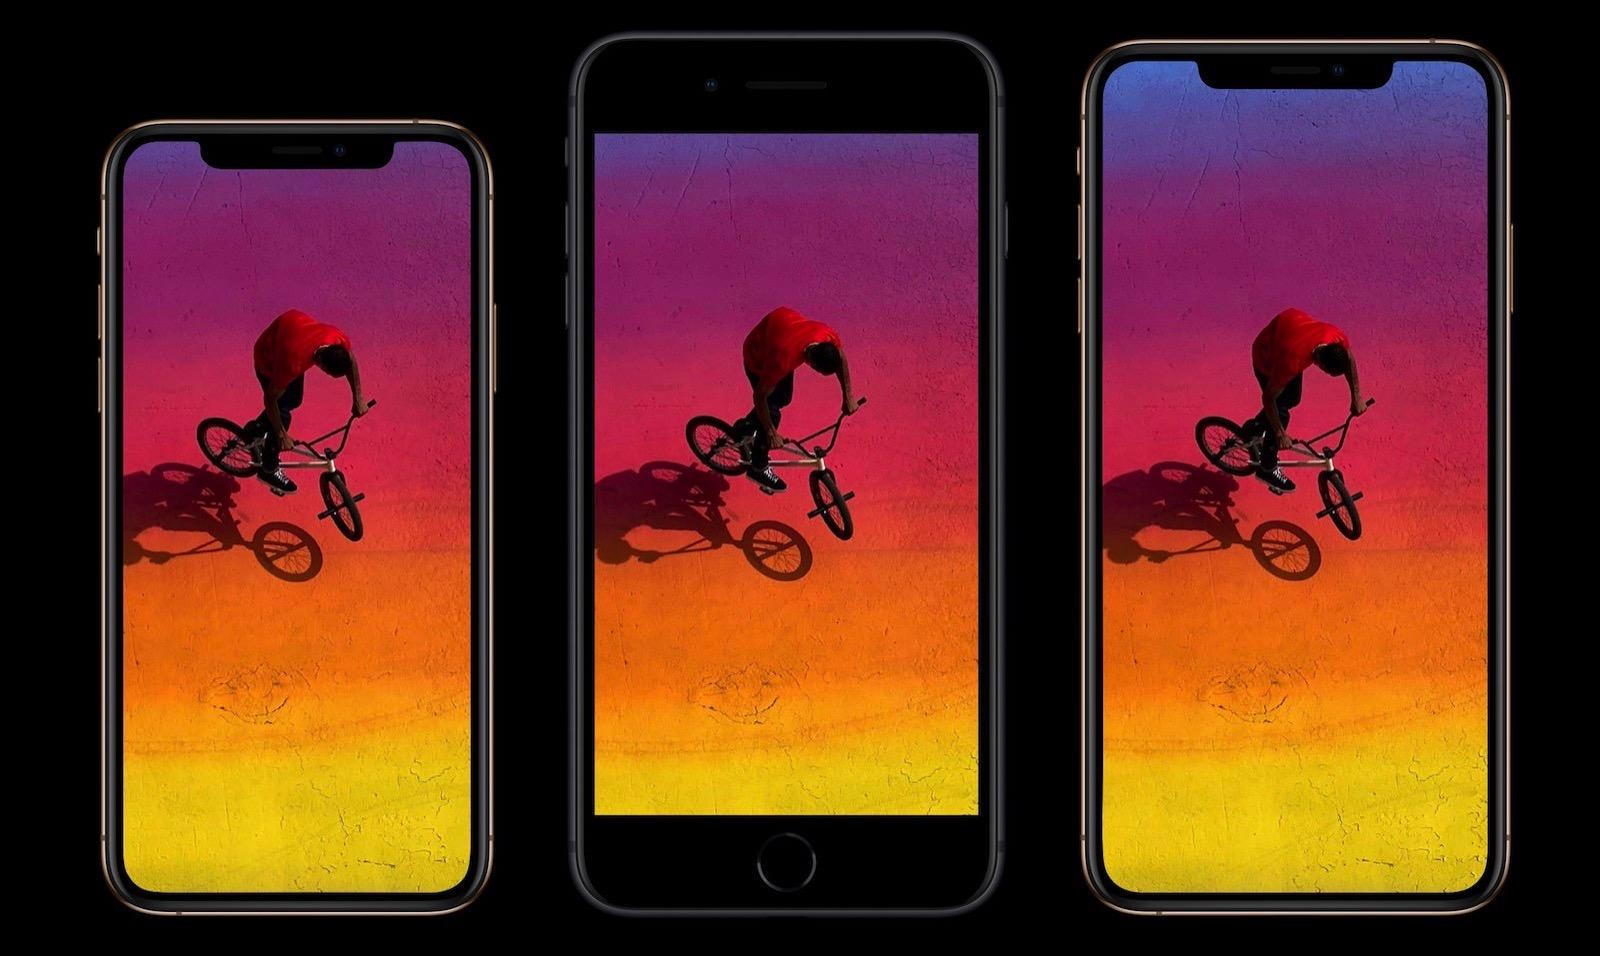 iphone-8plus-xs-xsmax-comparison.jpg